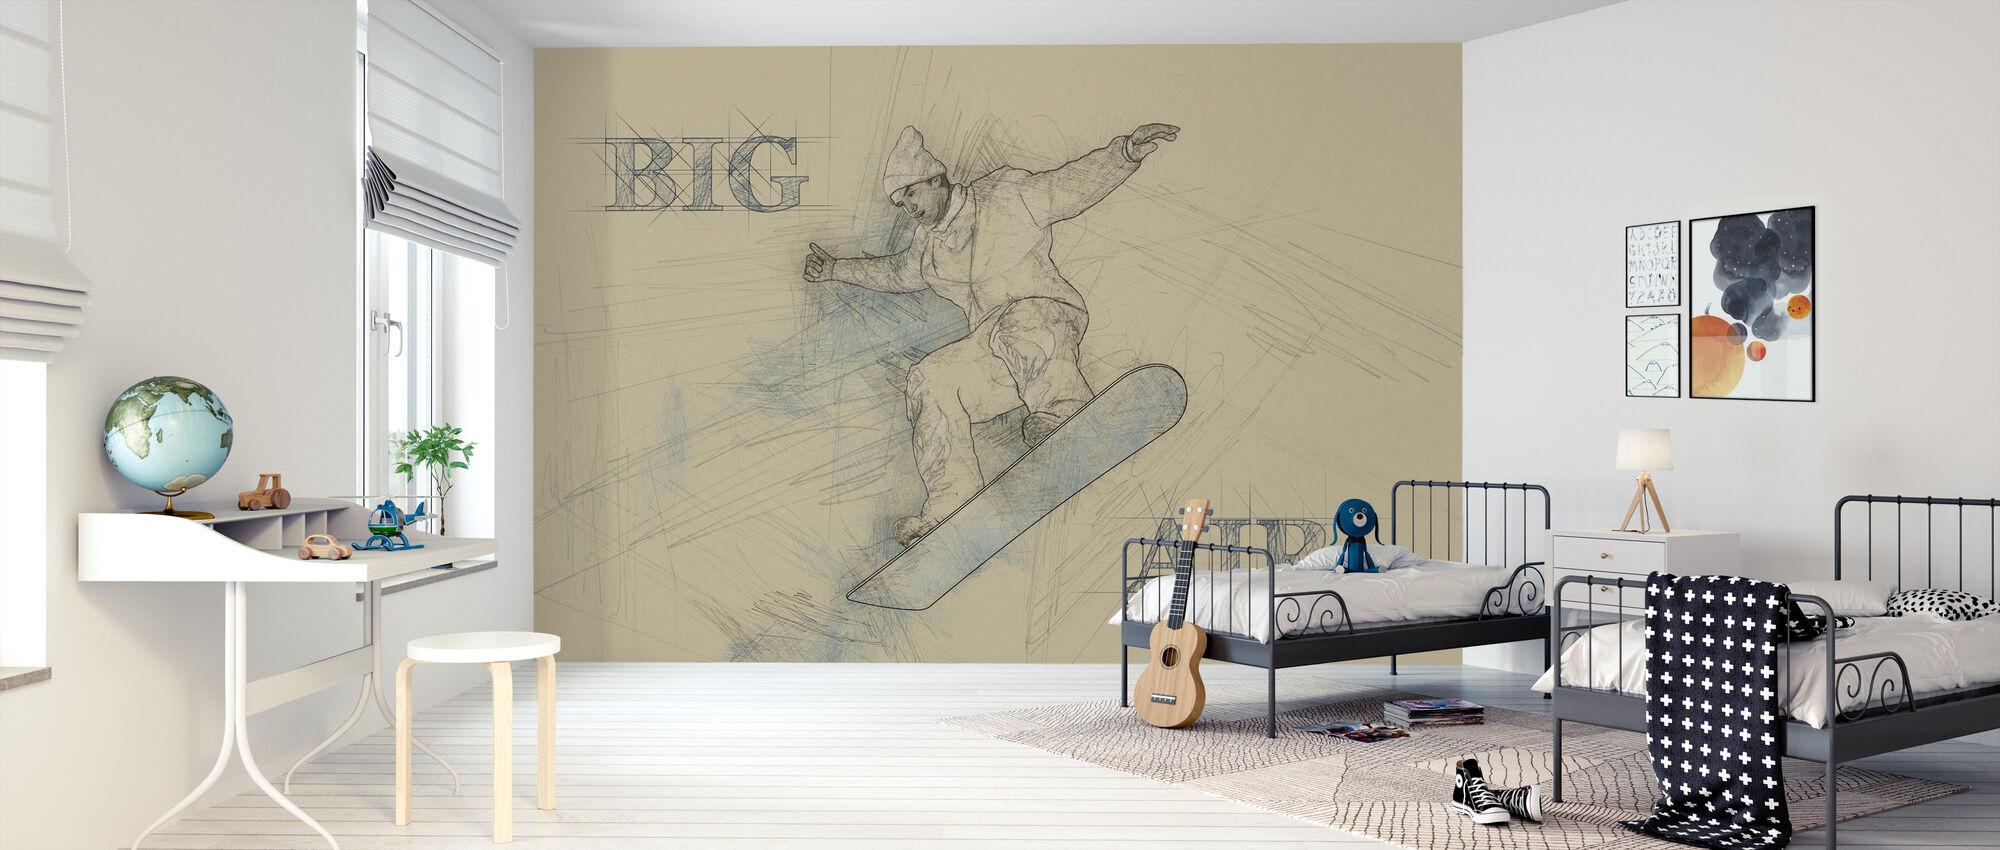 Big Air - Wallpaper - Kids Room